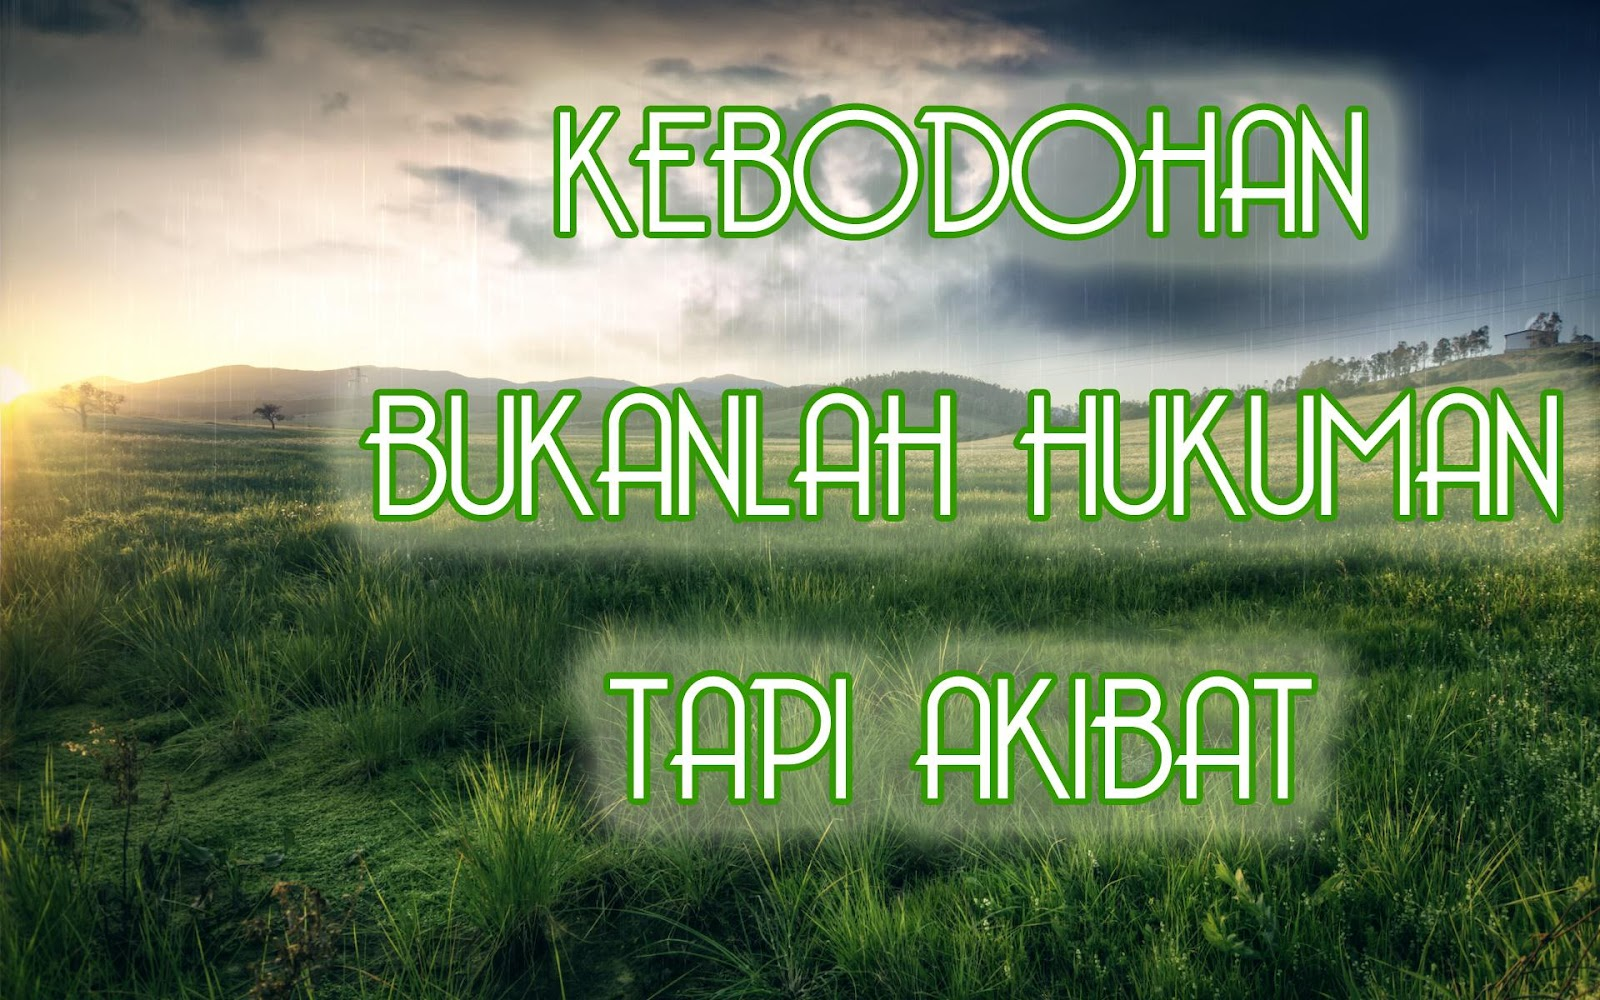 http://2.bp.blogspot.com/-PbI6tq8zhk8/UF8zI_v36XI/AAAAAAAAAxw/gS0D1-8wuqo/s1600/kata+mutiara-kata+kata+bijak-kata+kata+indah-kebodohan+bukan+hukaman+tapi+akibat.jpg